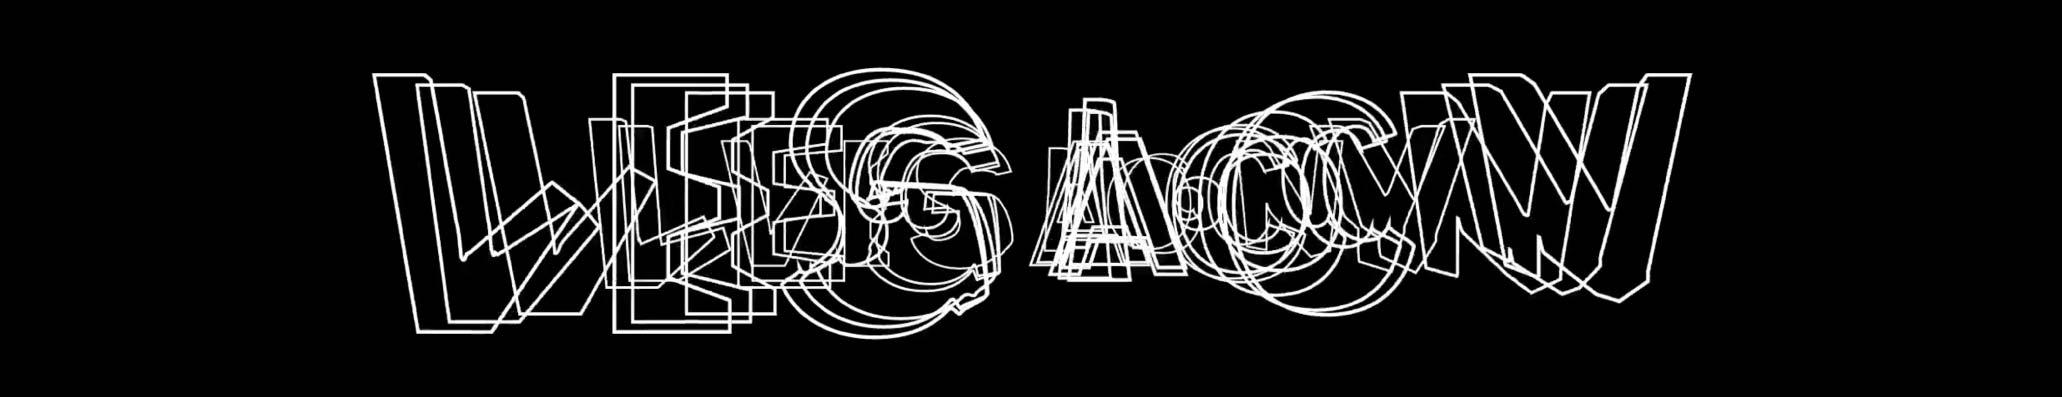 animation-banner-3